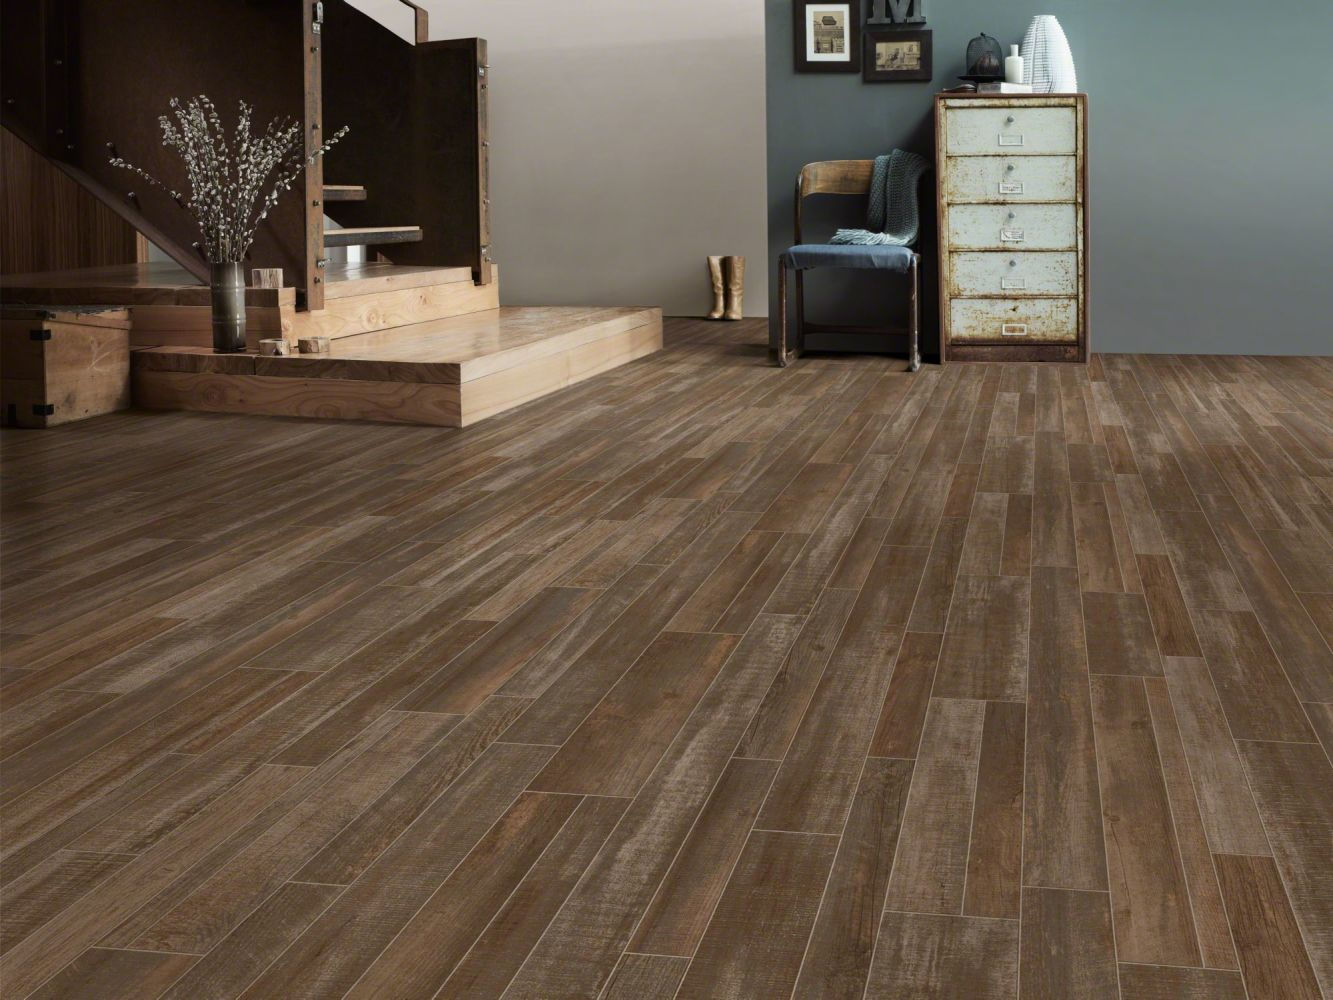 Shaw Floors Resilient Residential Plateau II Sparta 00565_527SA